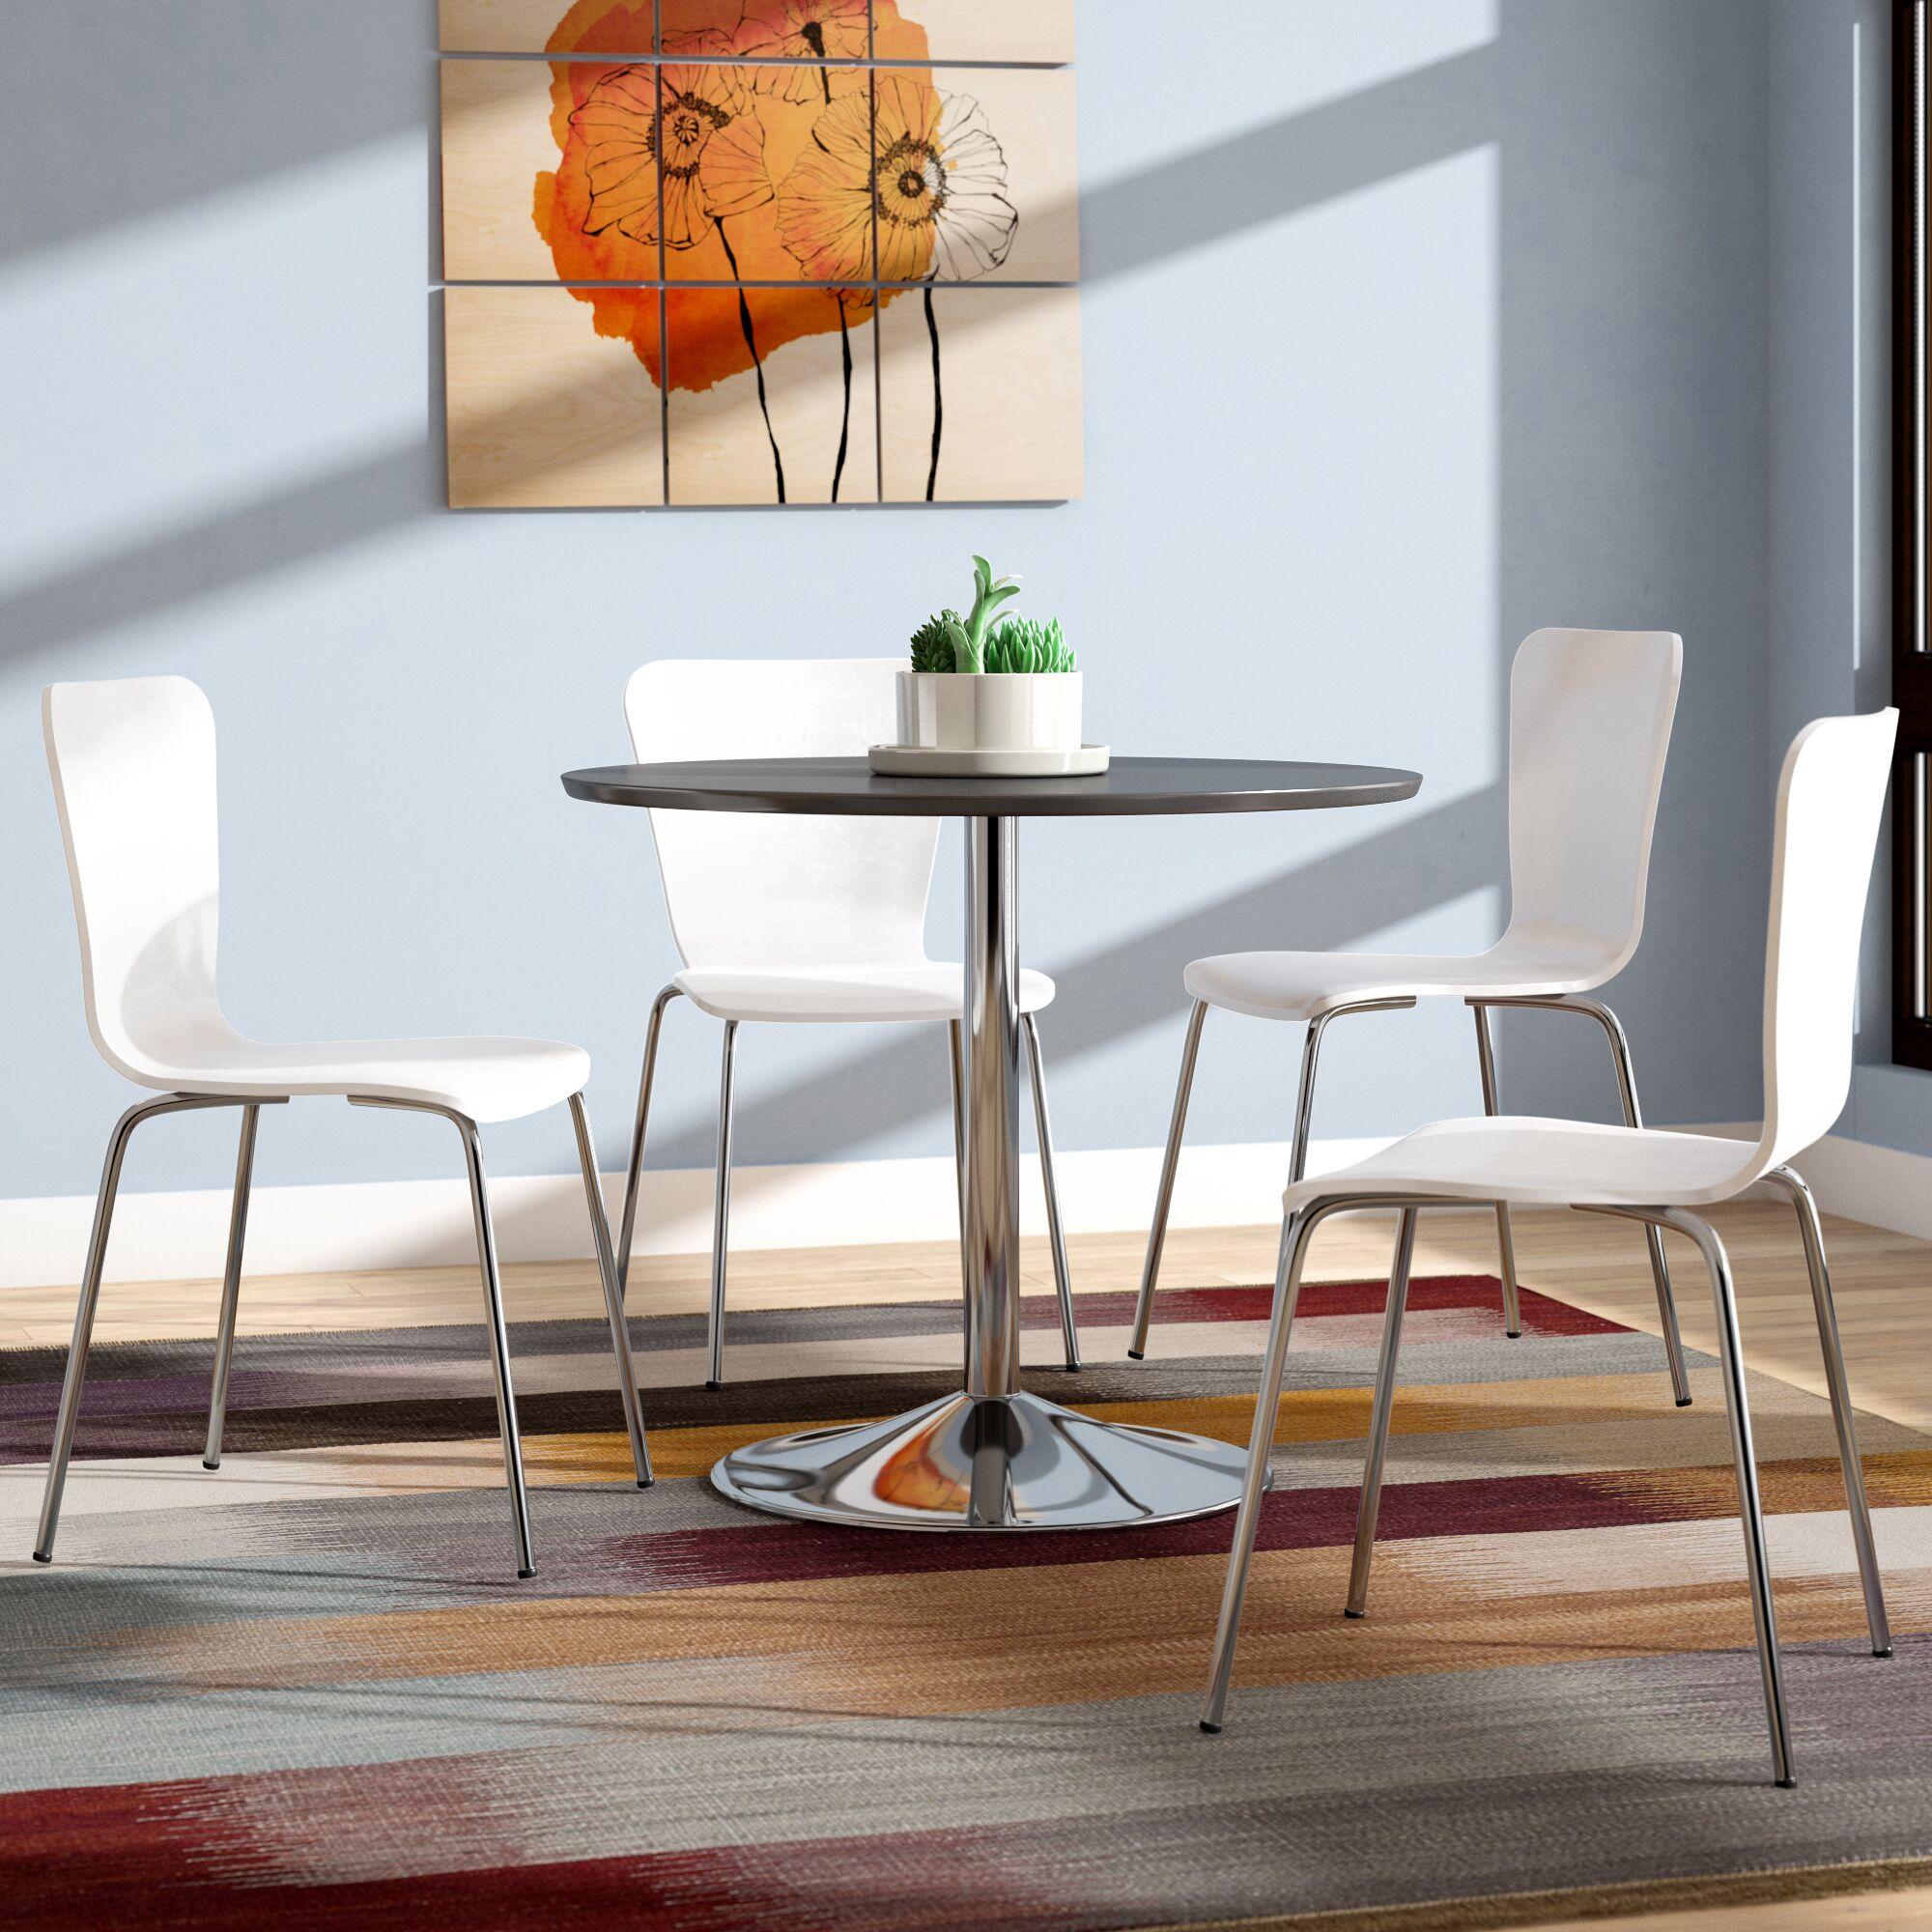 Saladino 5 Piece Dining Set Chair Color: White